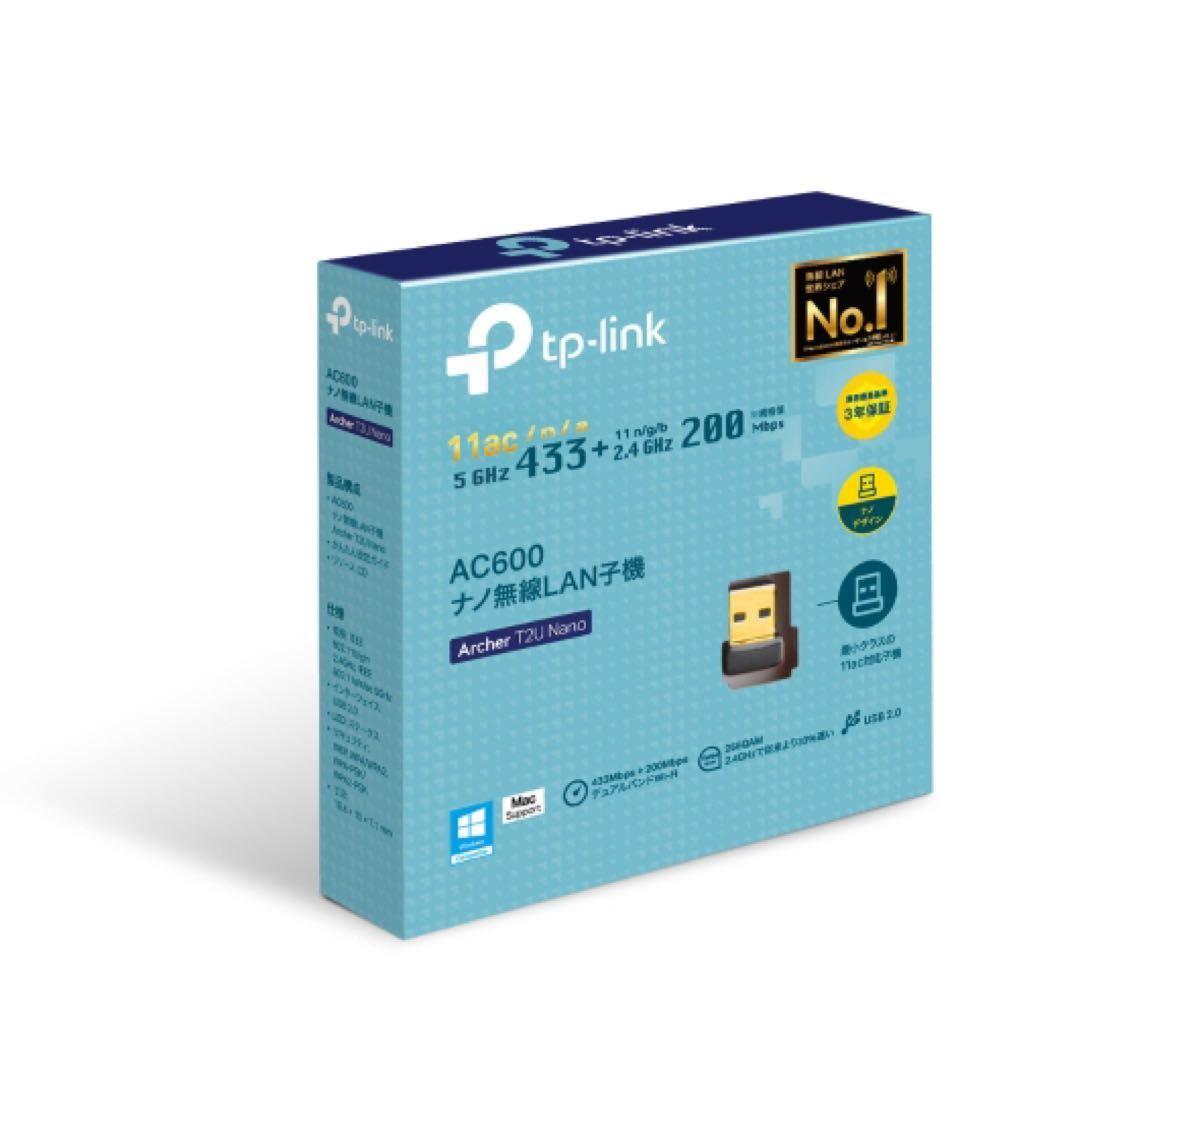 TP-Link ティーピーリンク RE200[中継機]+T2U Nano [AC600 ナノ 無線LAN子機]【新品未使用】